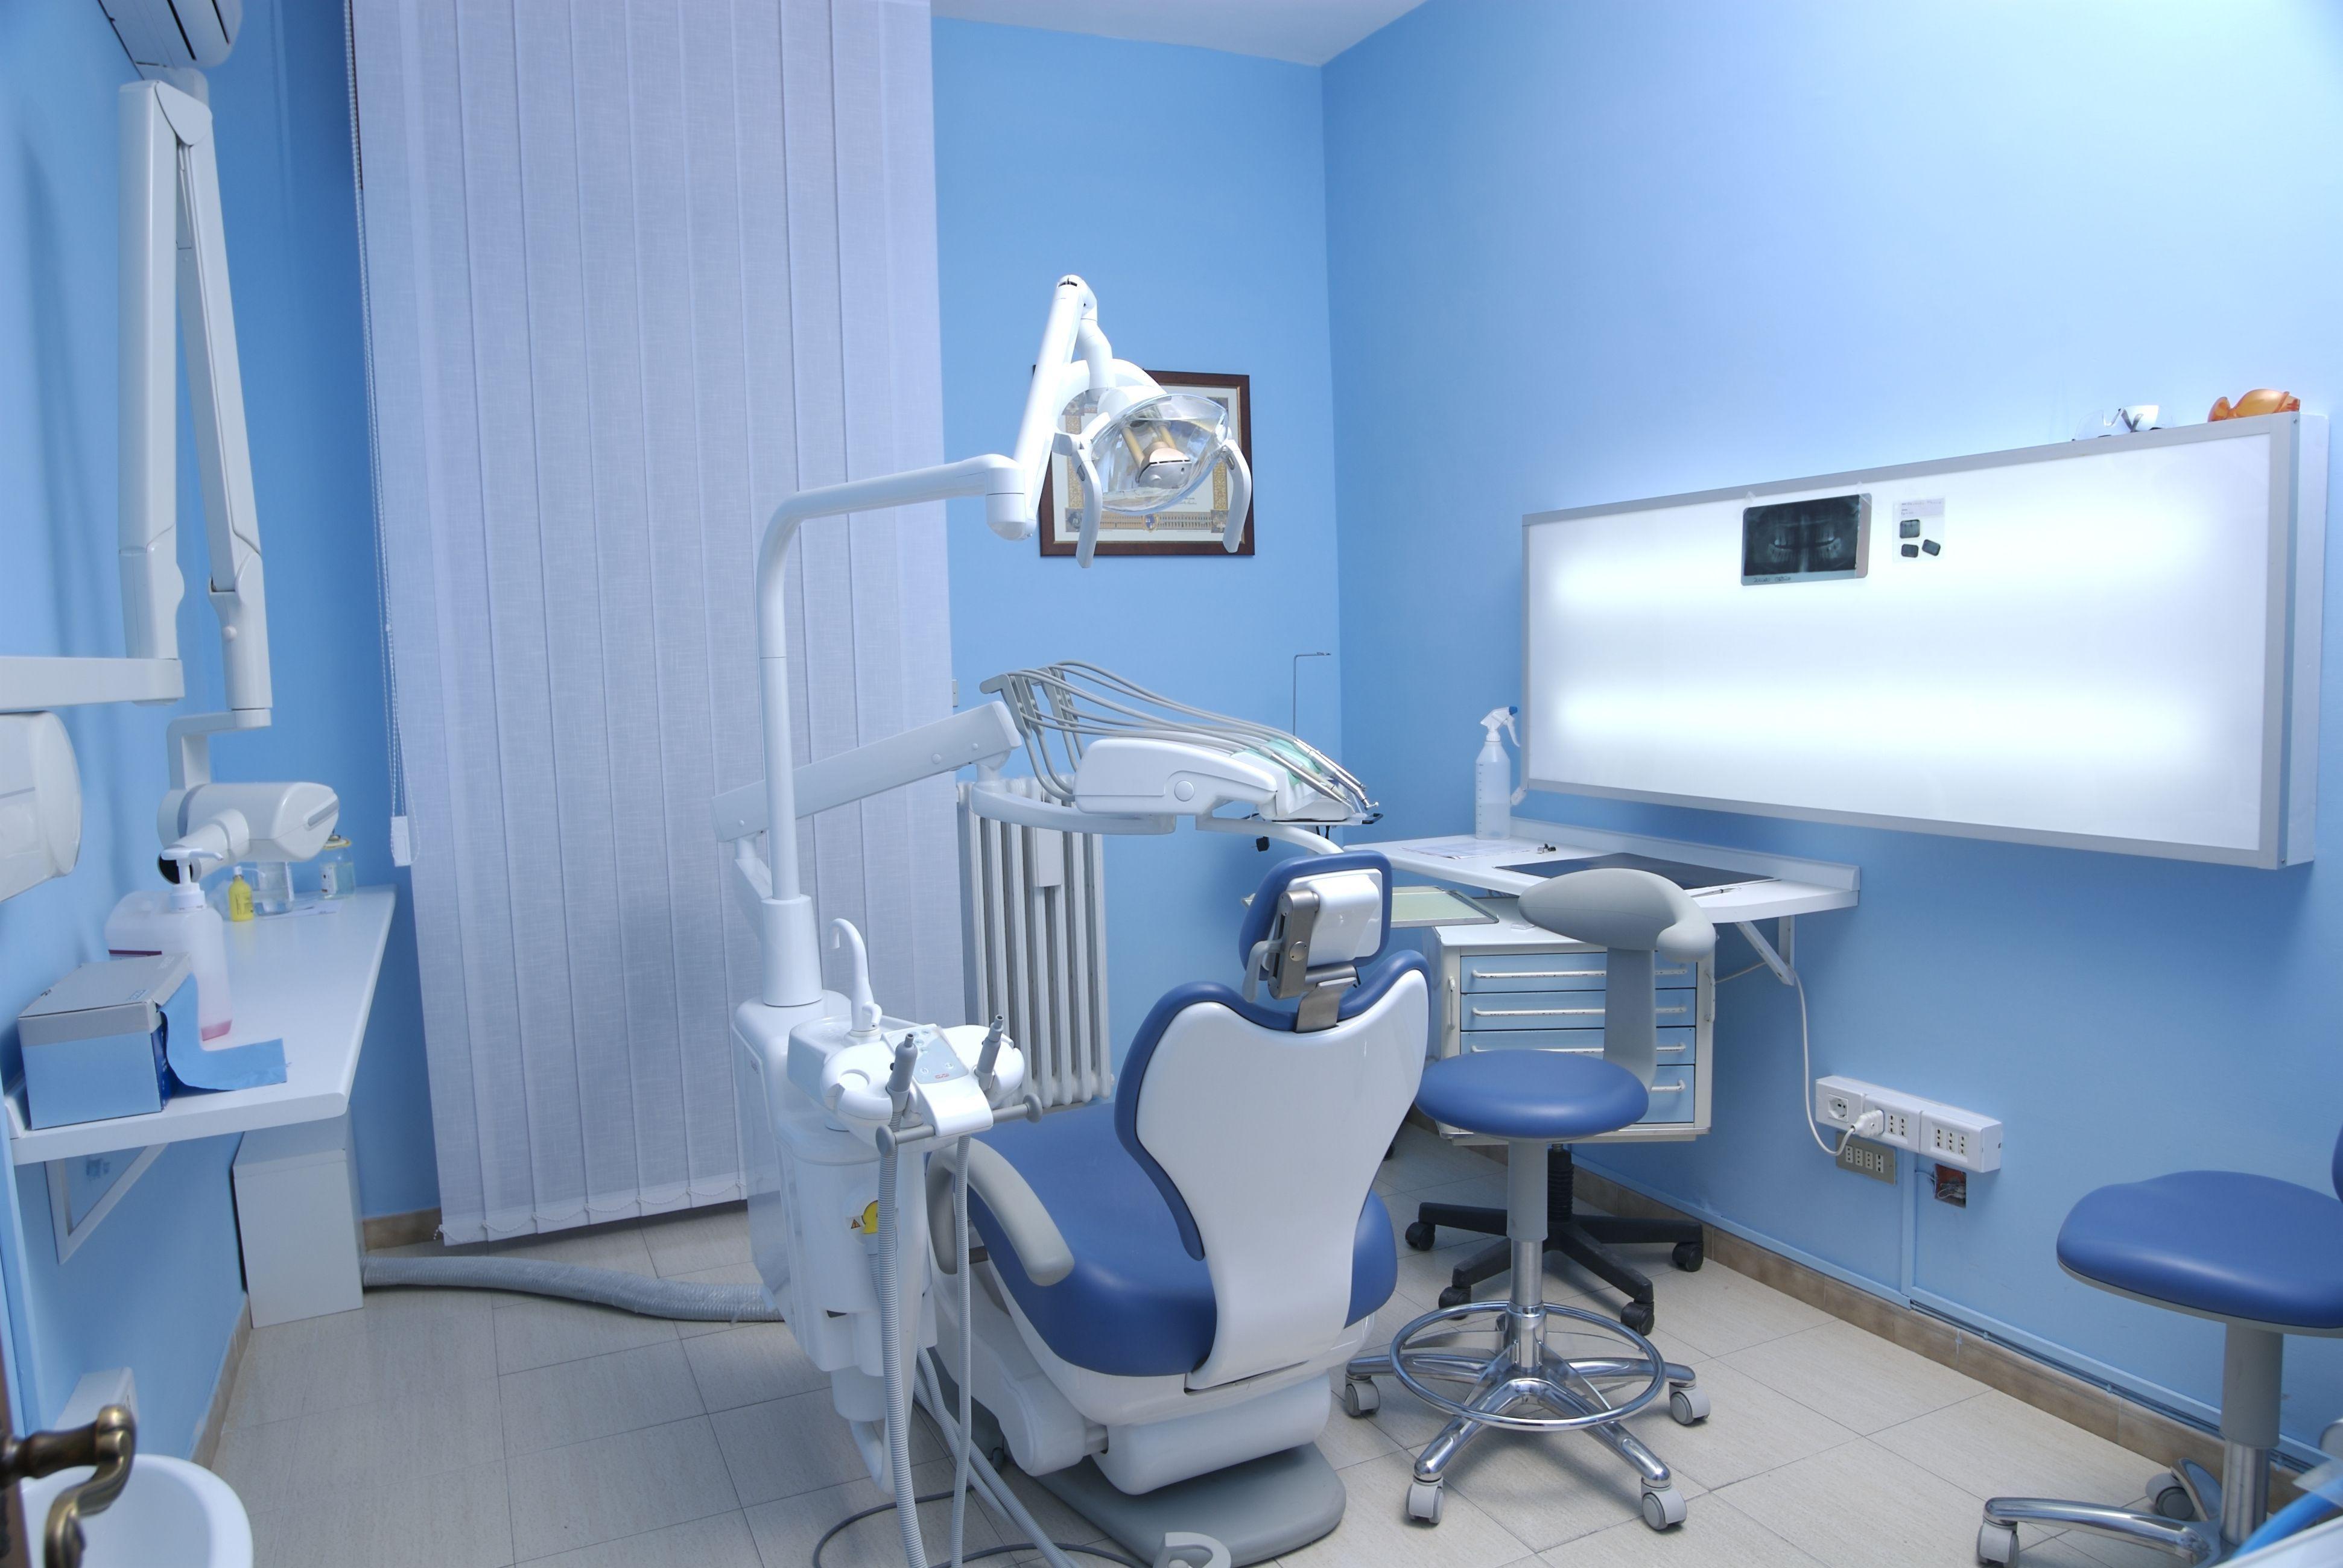 24 hour Emergency Dental Clinic Cost Near Me Emergency